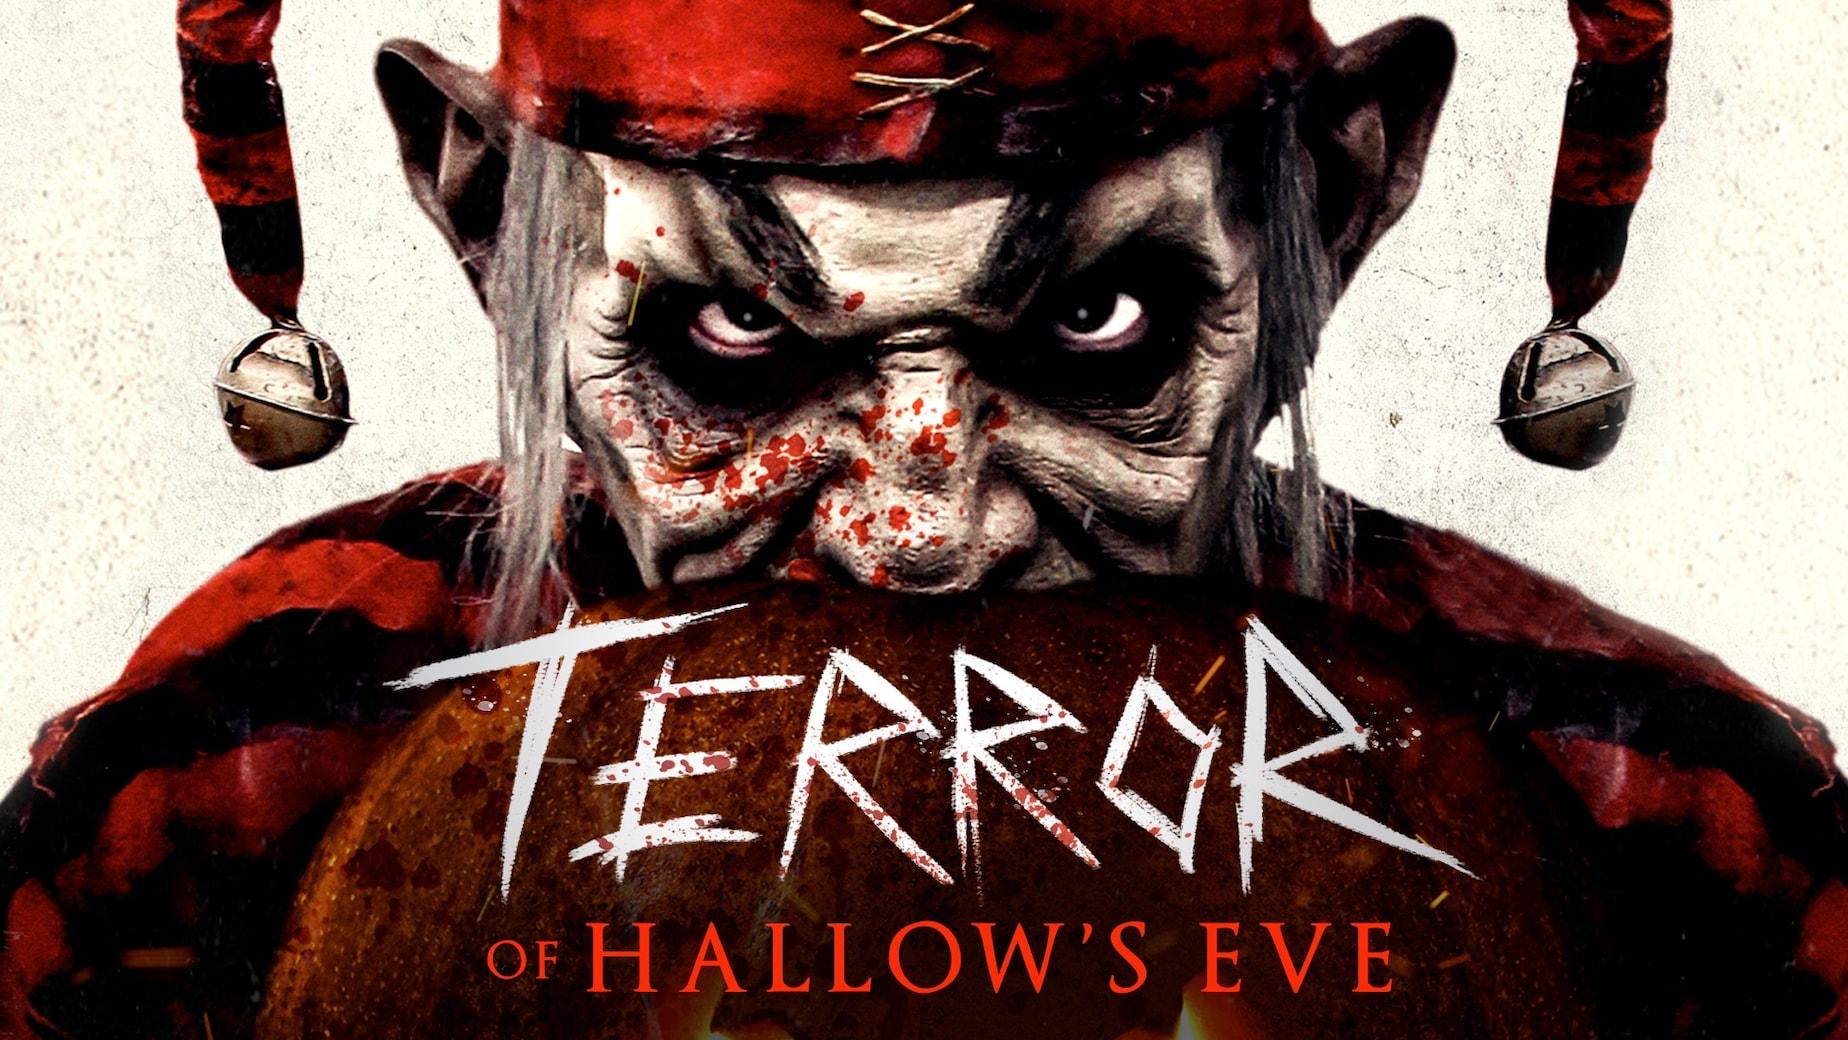 The Terror of Hallow's Eve Full Movie - Watch Online, Stream